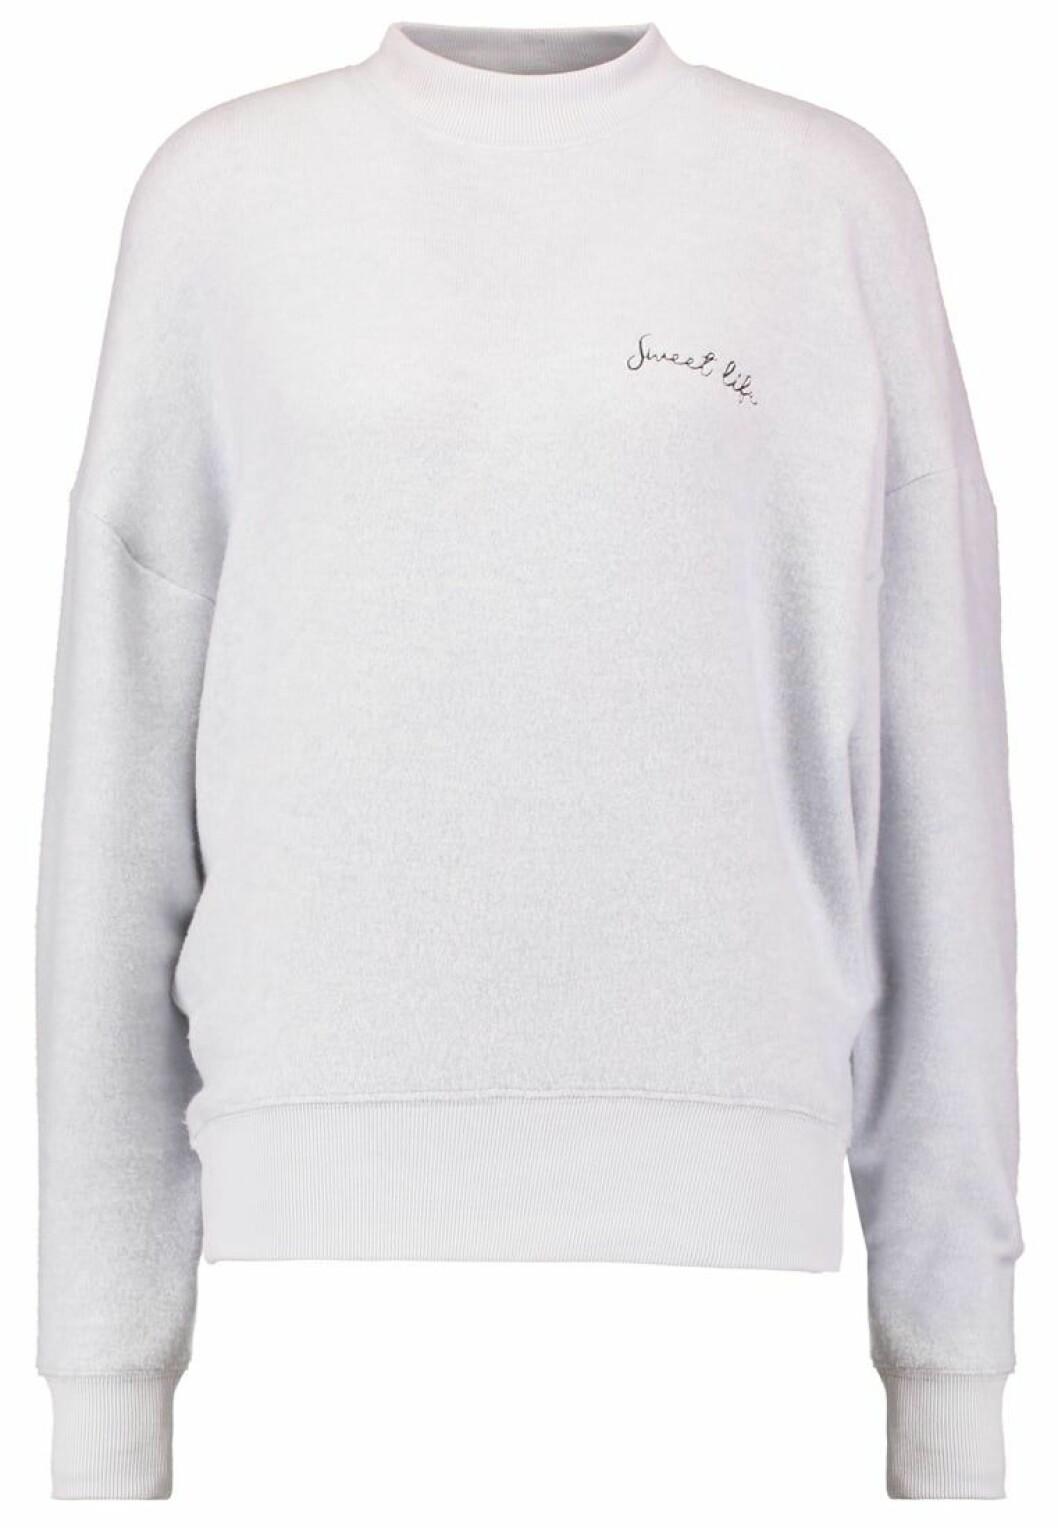 sweatshirt topshop sweet life